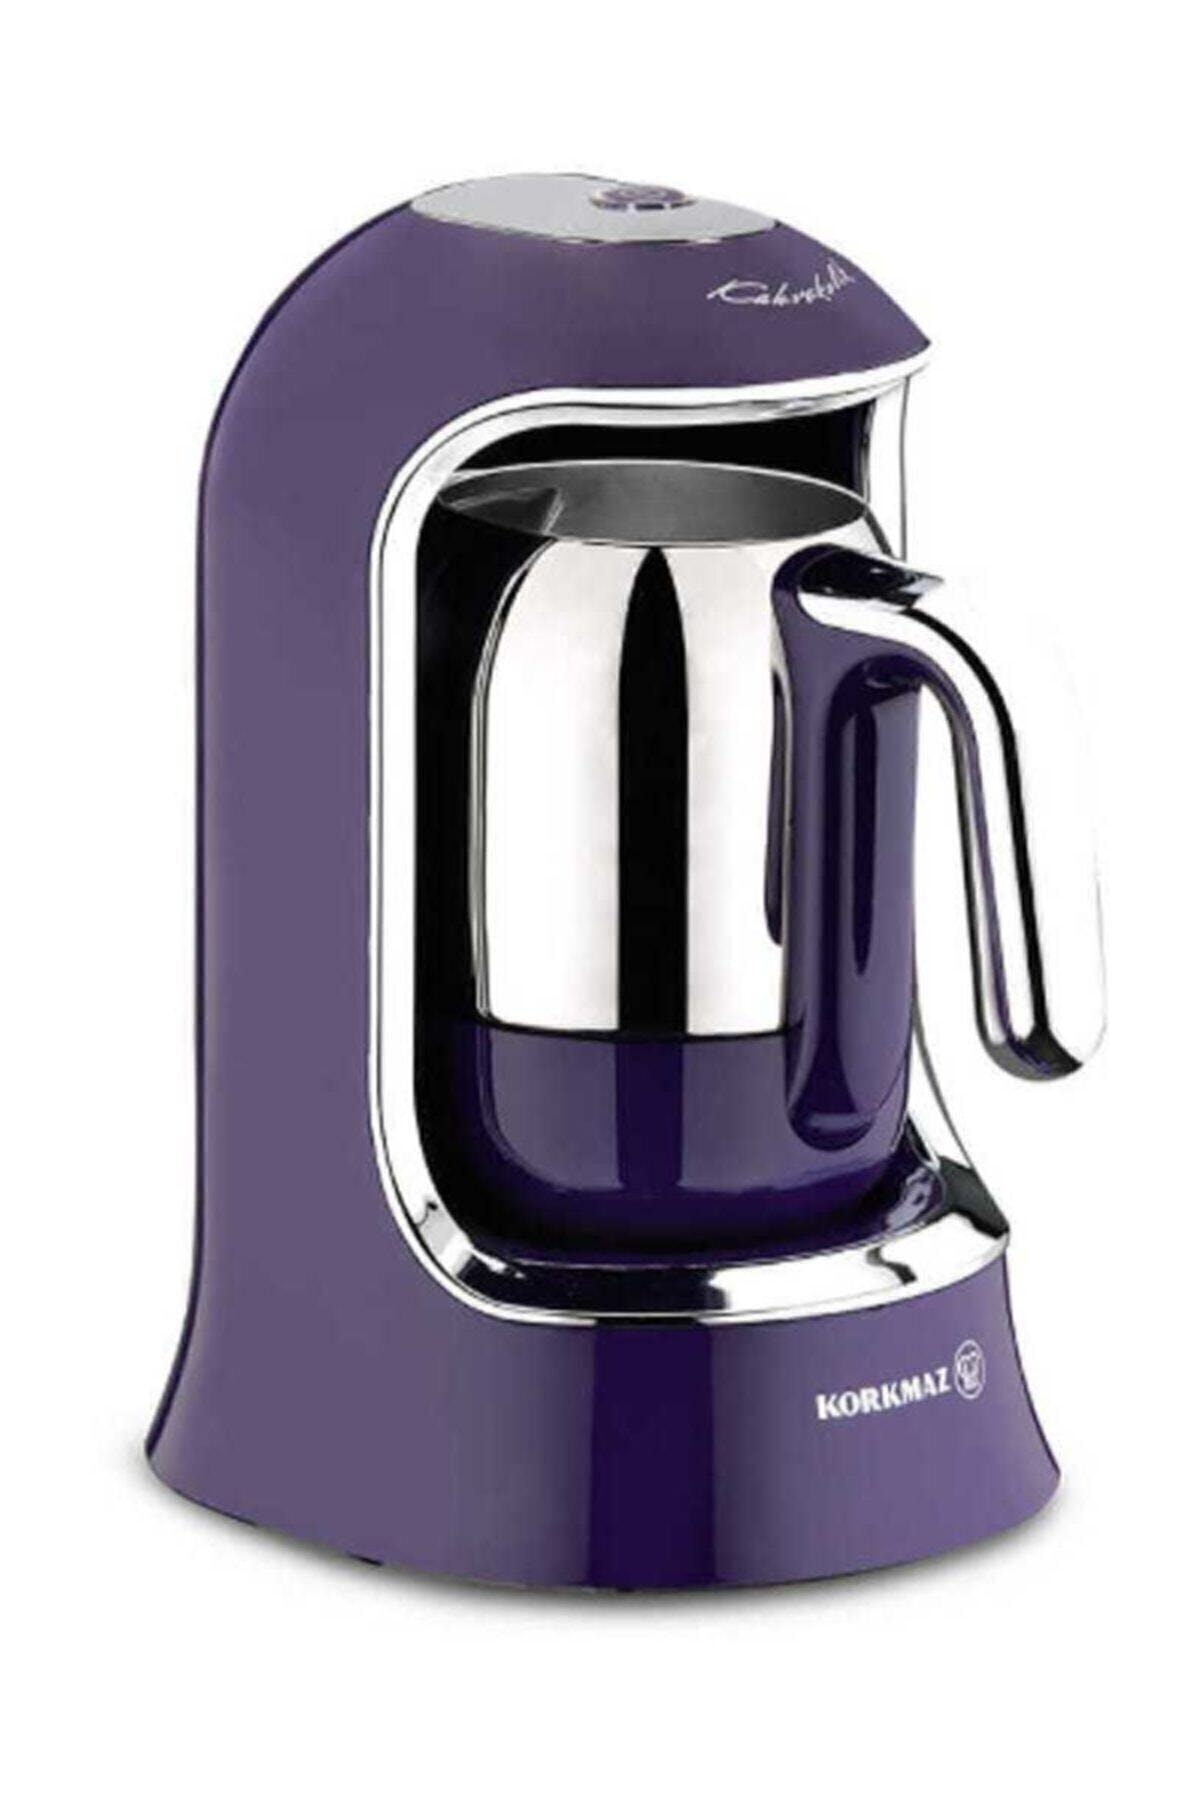 KORKMAZ A860-01 Kahvekolik Lavanta Kahve Makinesi 1